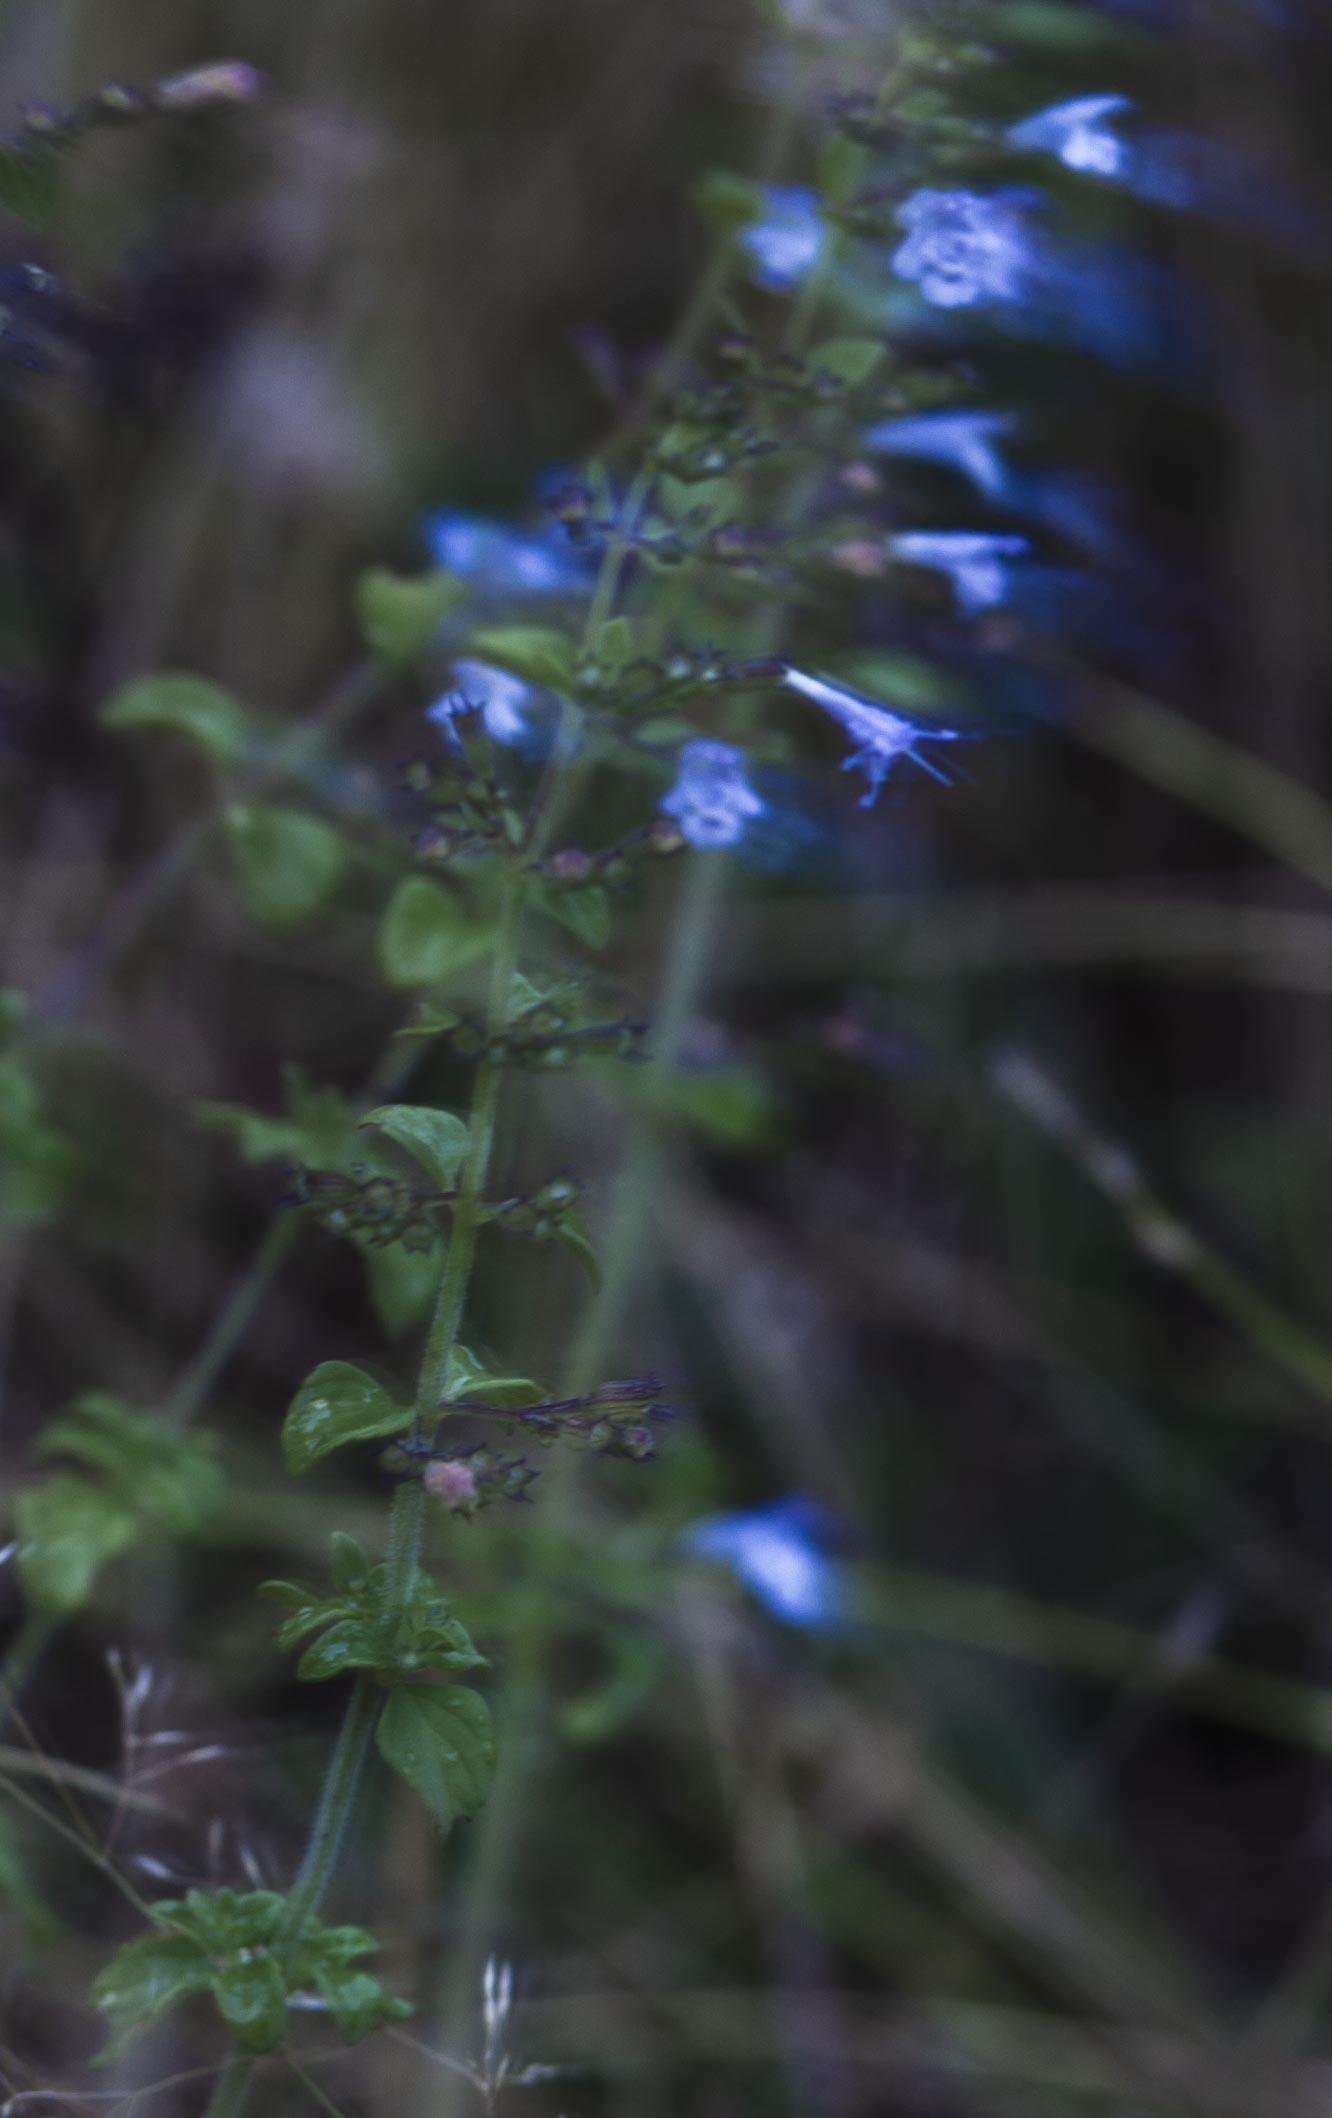 Blume Farbdia ca. 60x38cm, 2014